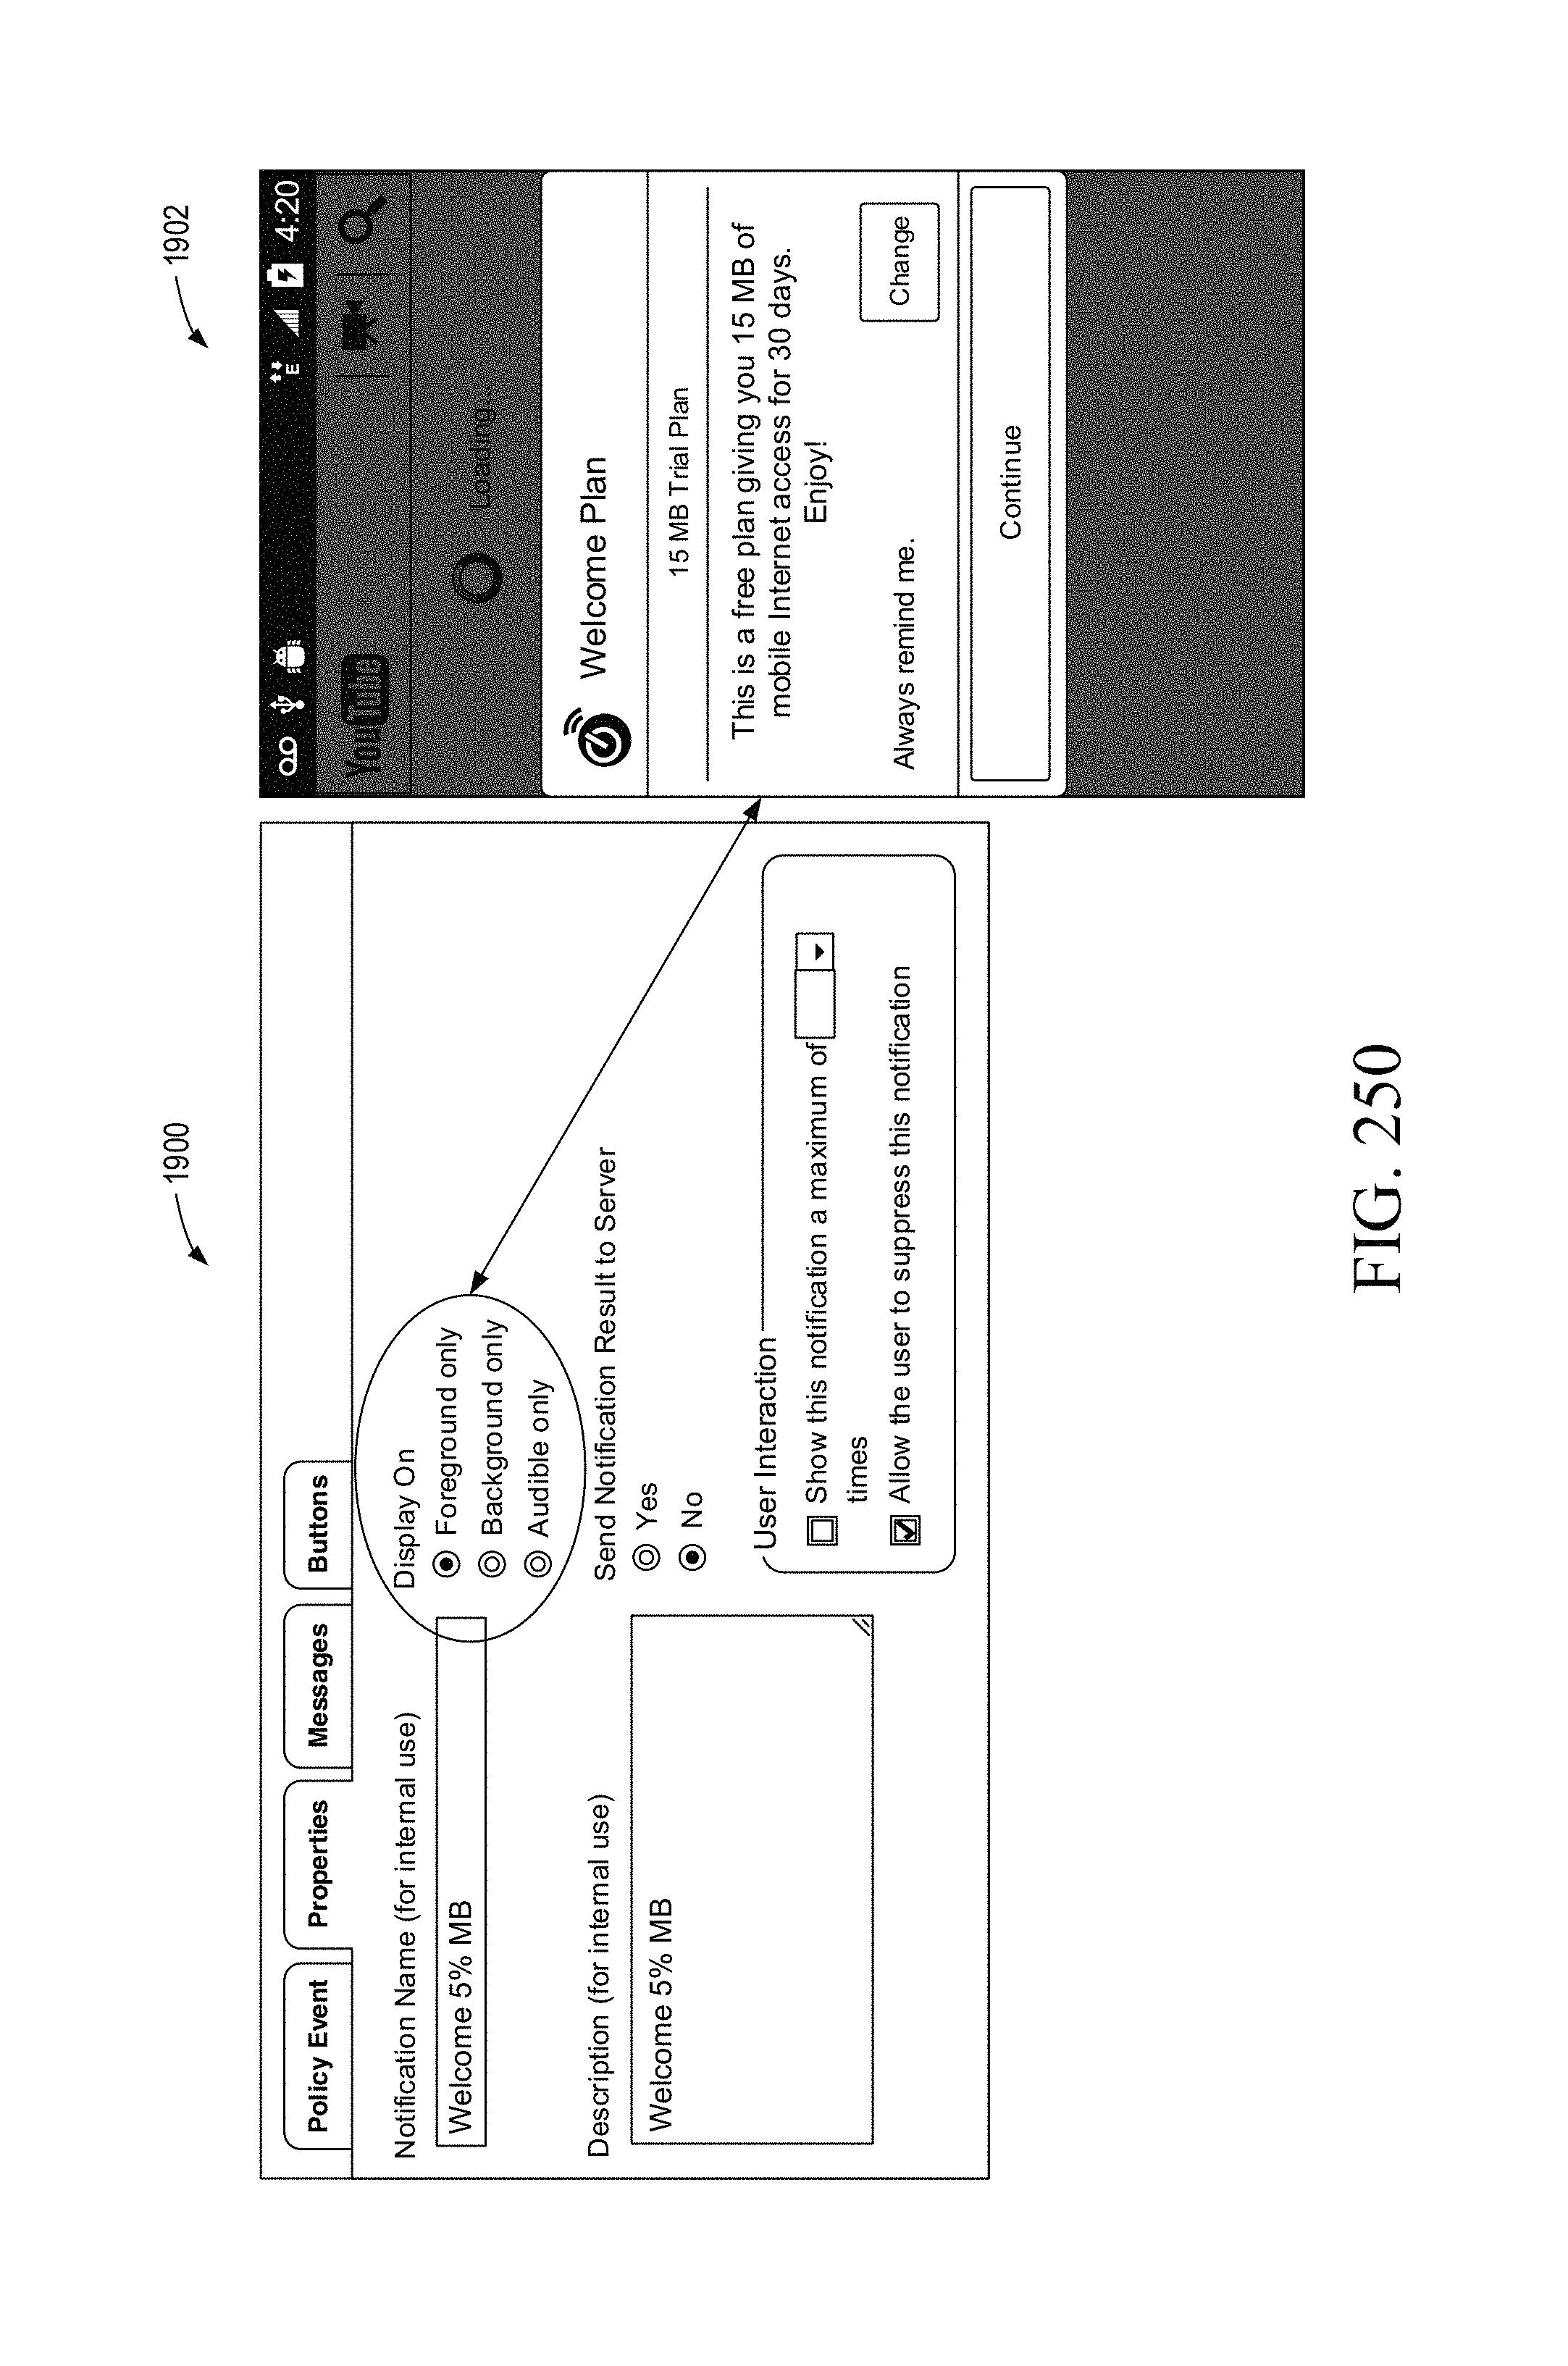 patent us 9,955,332 b2Voiceactivated Tape Recorder Switch Circuit Diagram Tradeoficcom #7